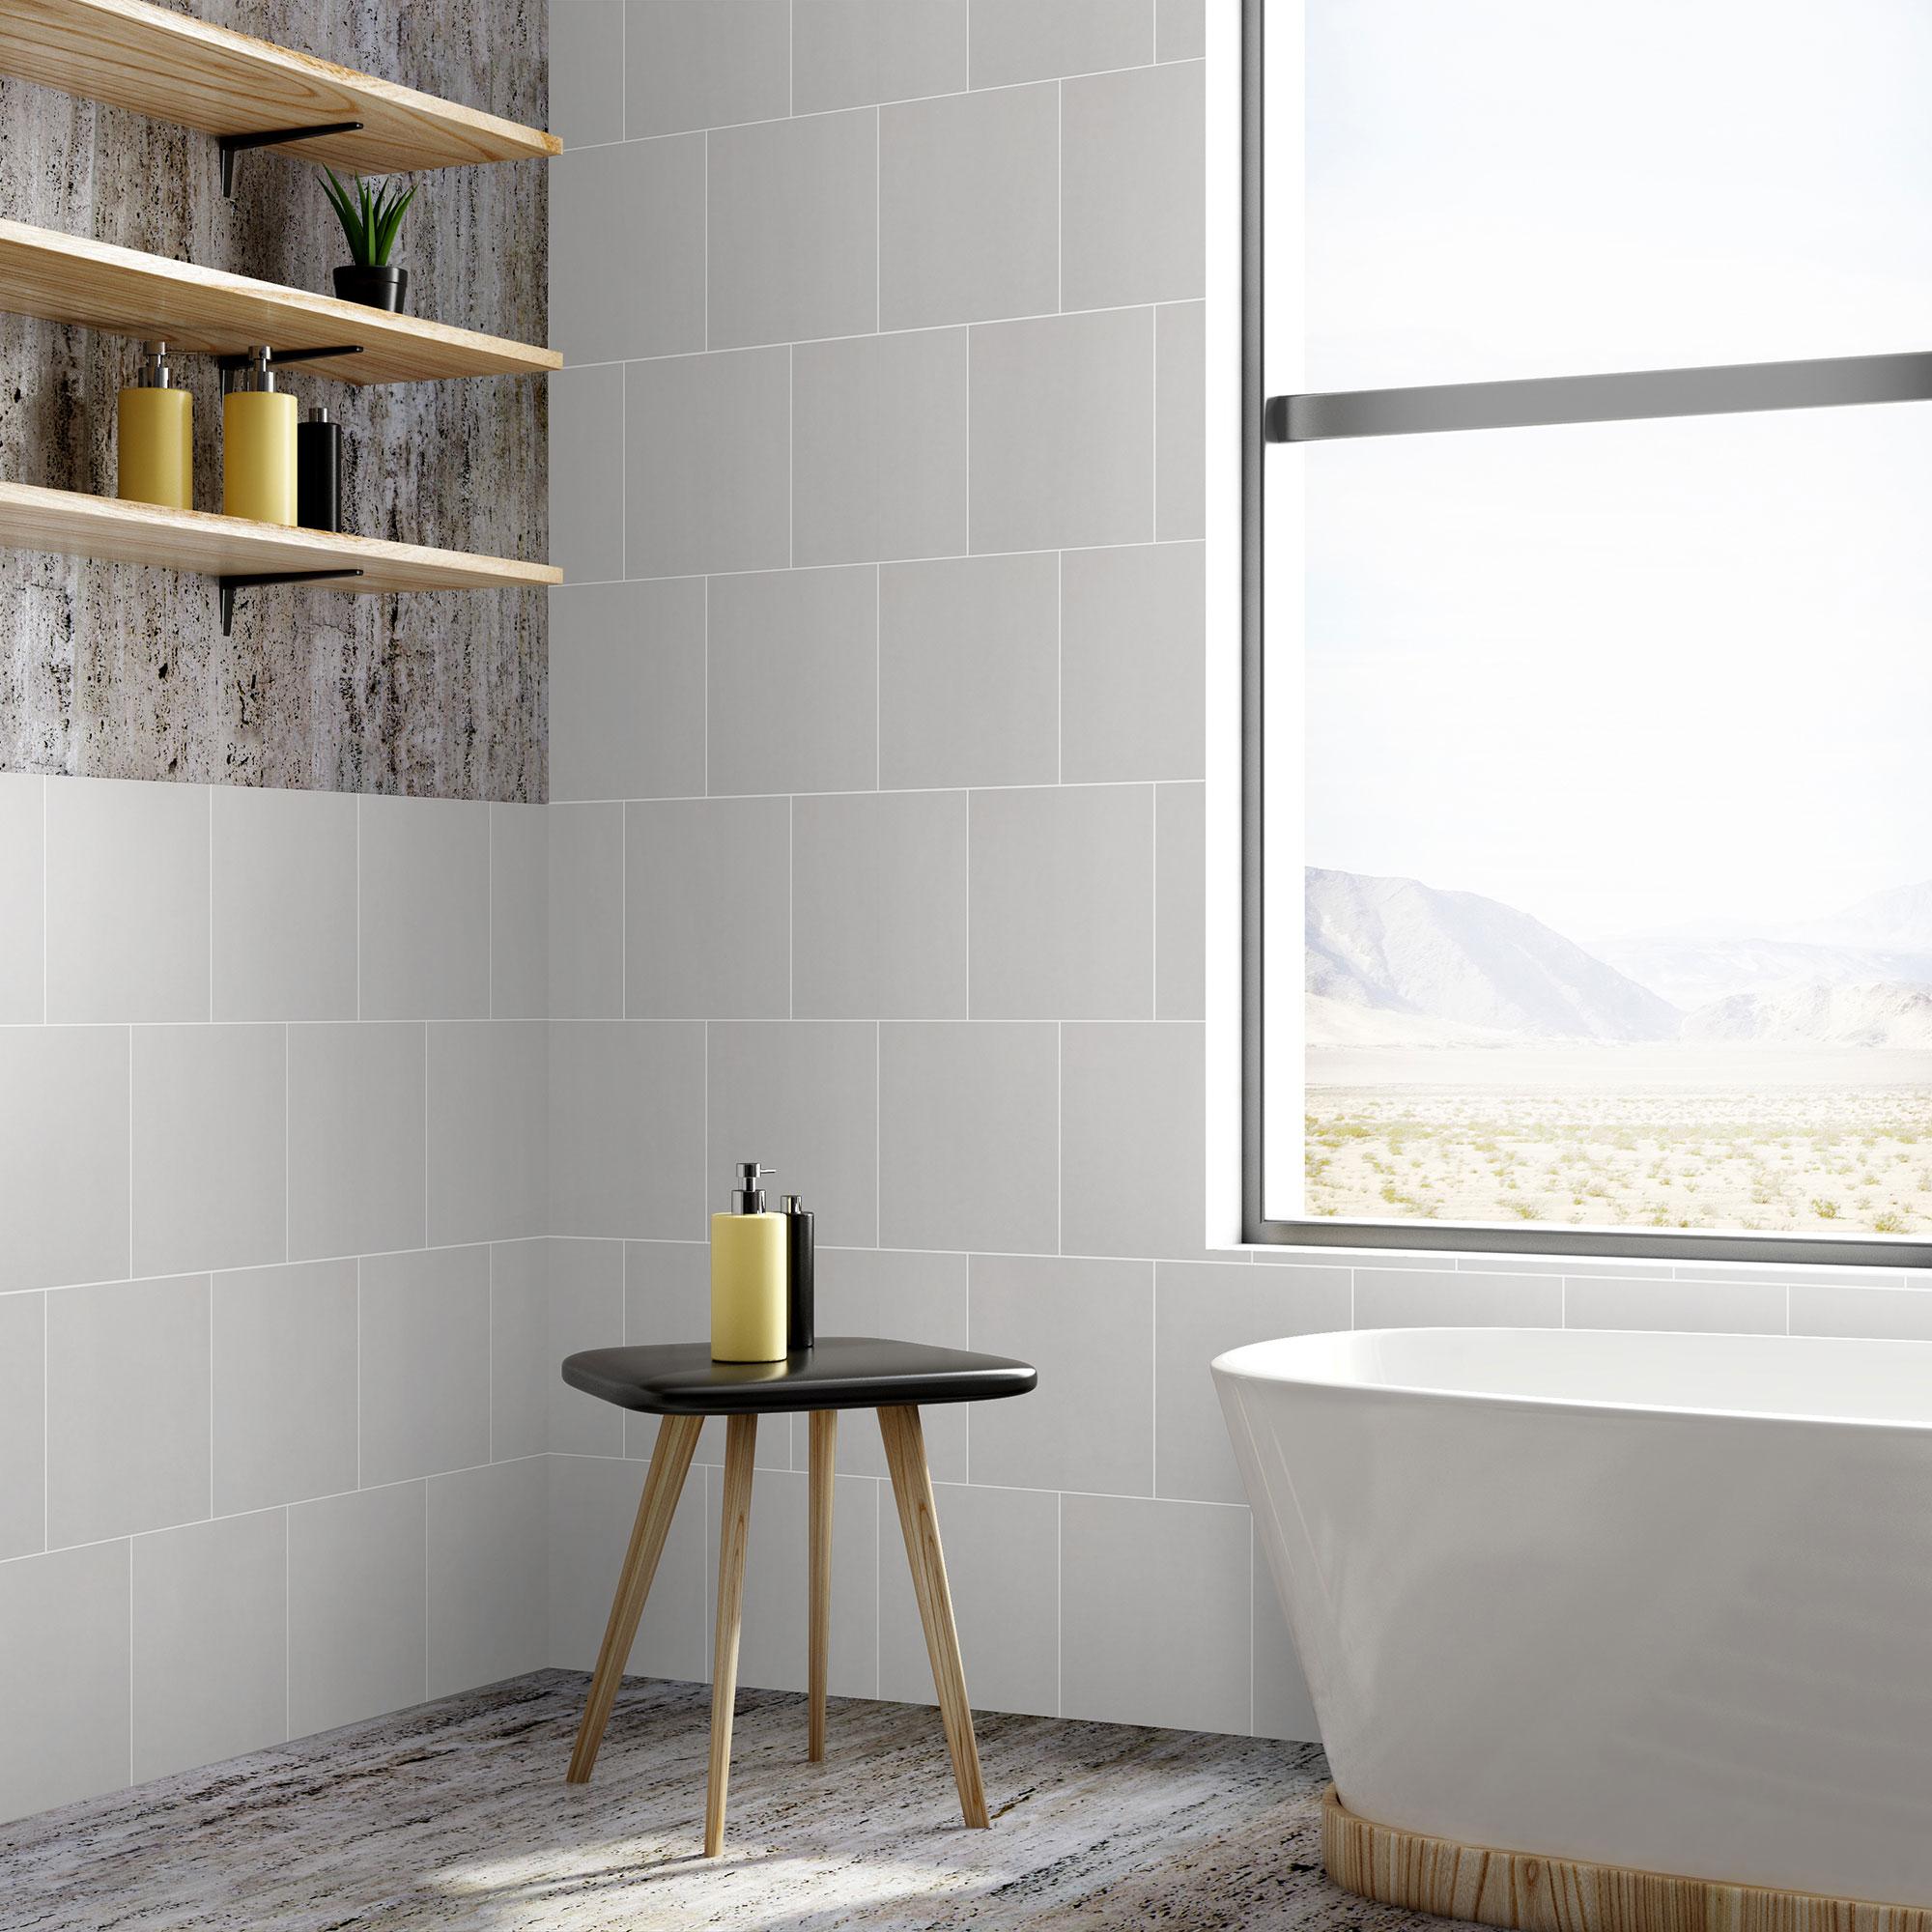 Klinker Unicolor Light Grey 20×20 cm